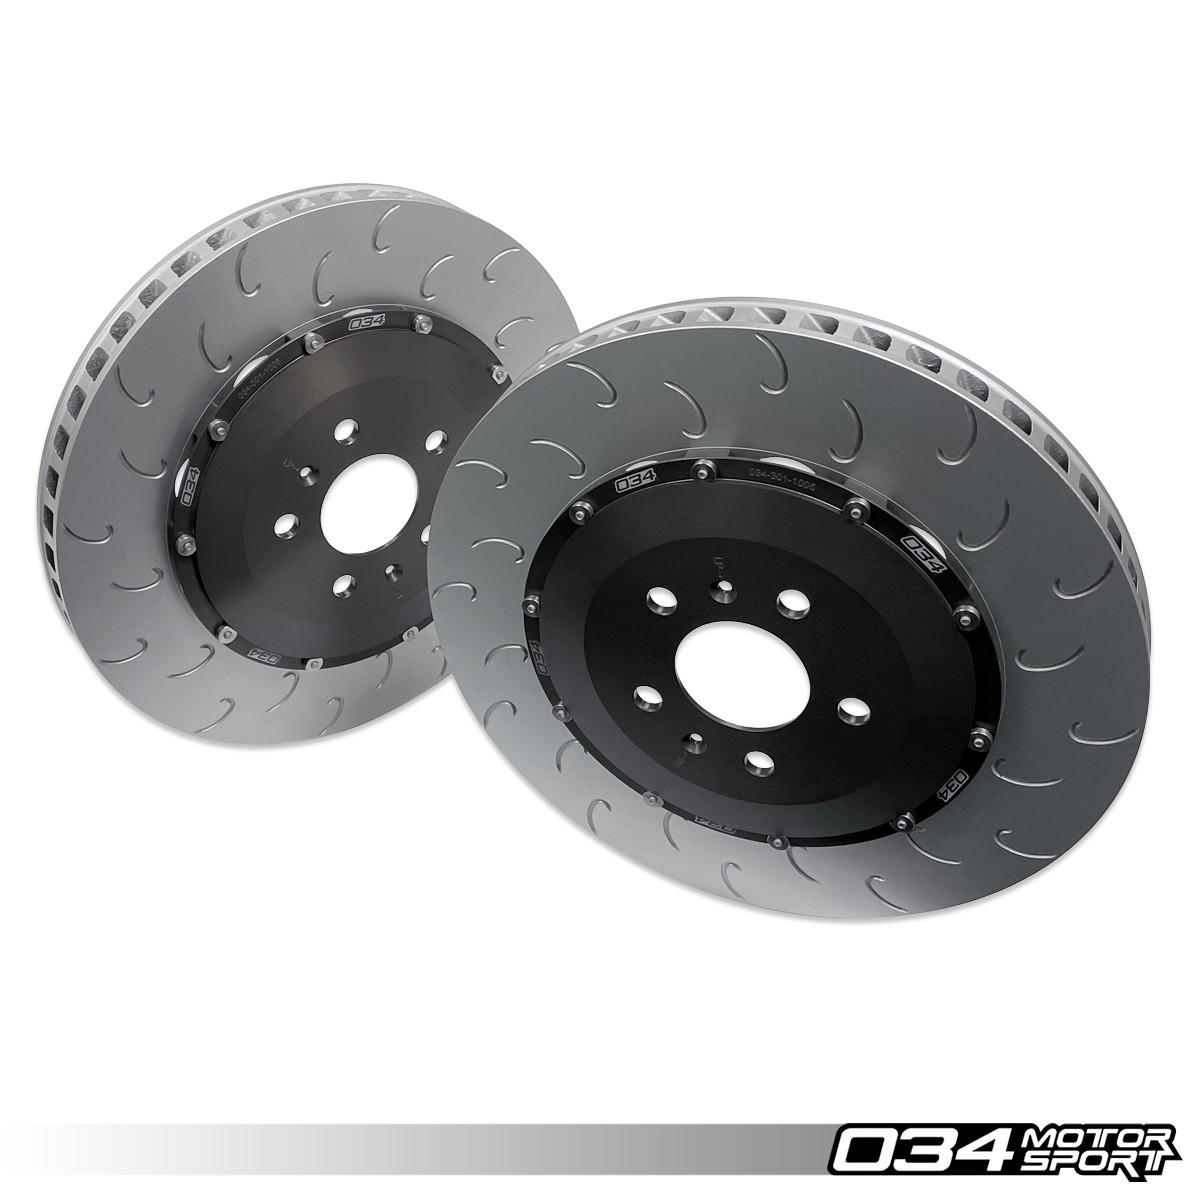 2-Piece Floating Rear Brake Rotor Upgrade Kit, Gen 1 & Gen 1.5 R8 034-301-2005